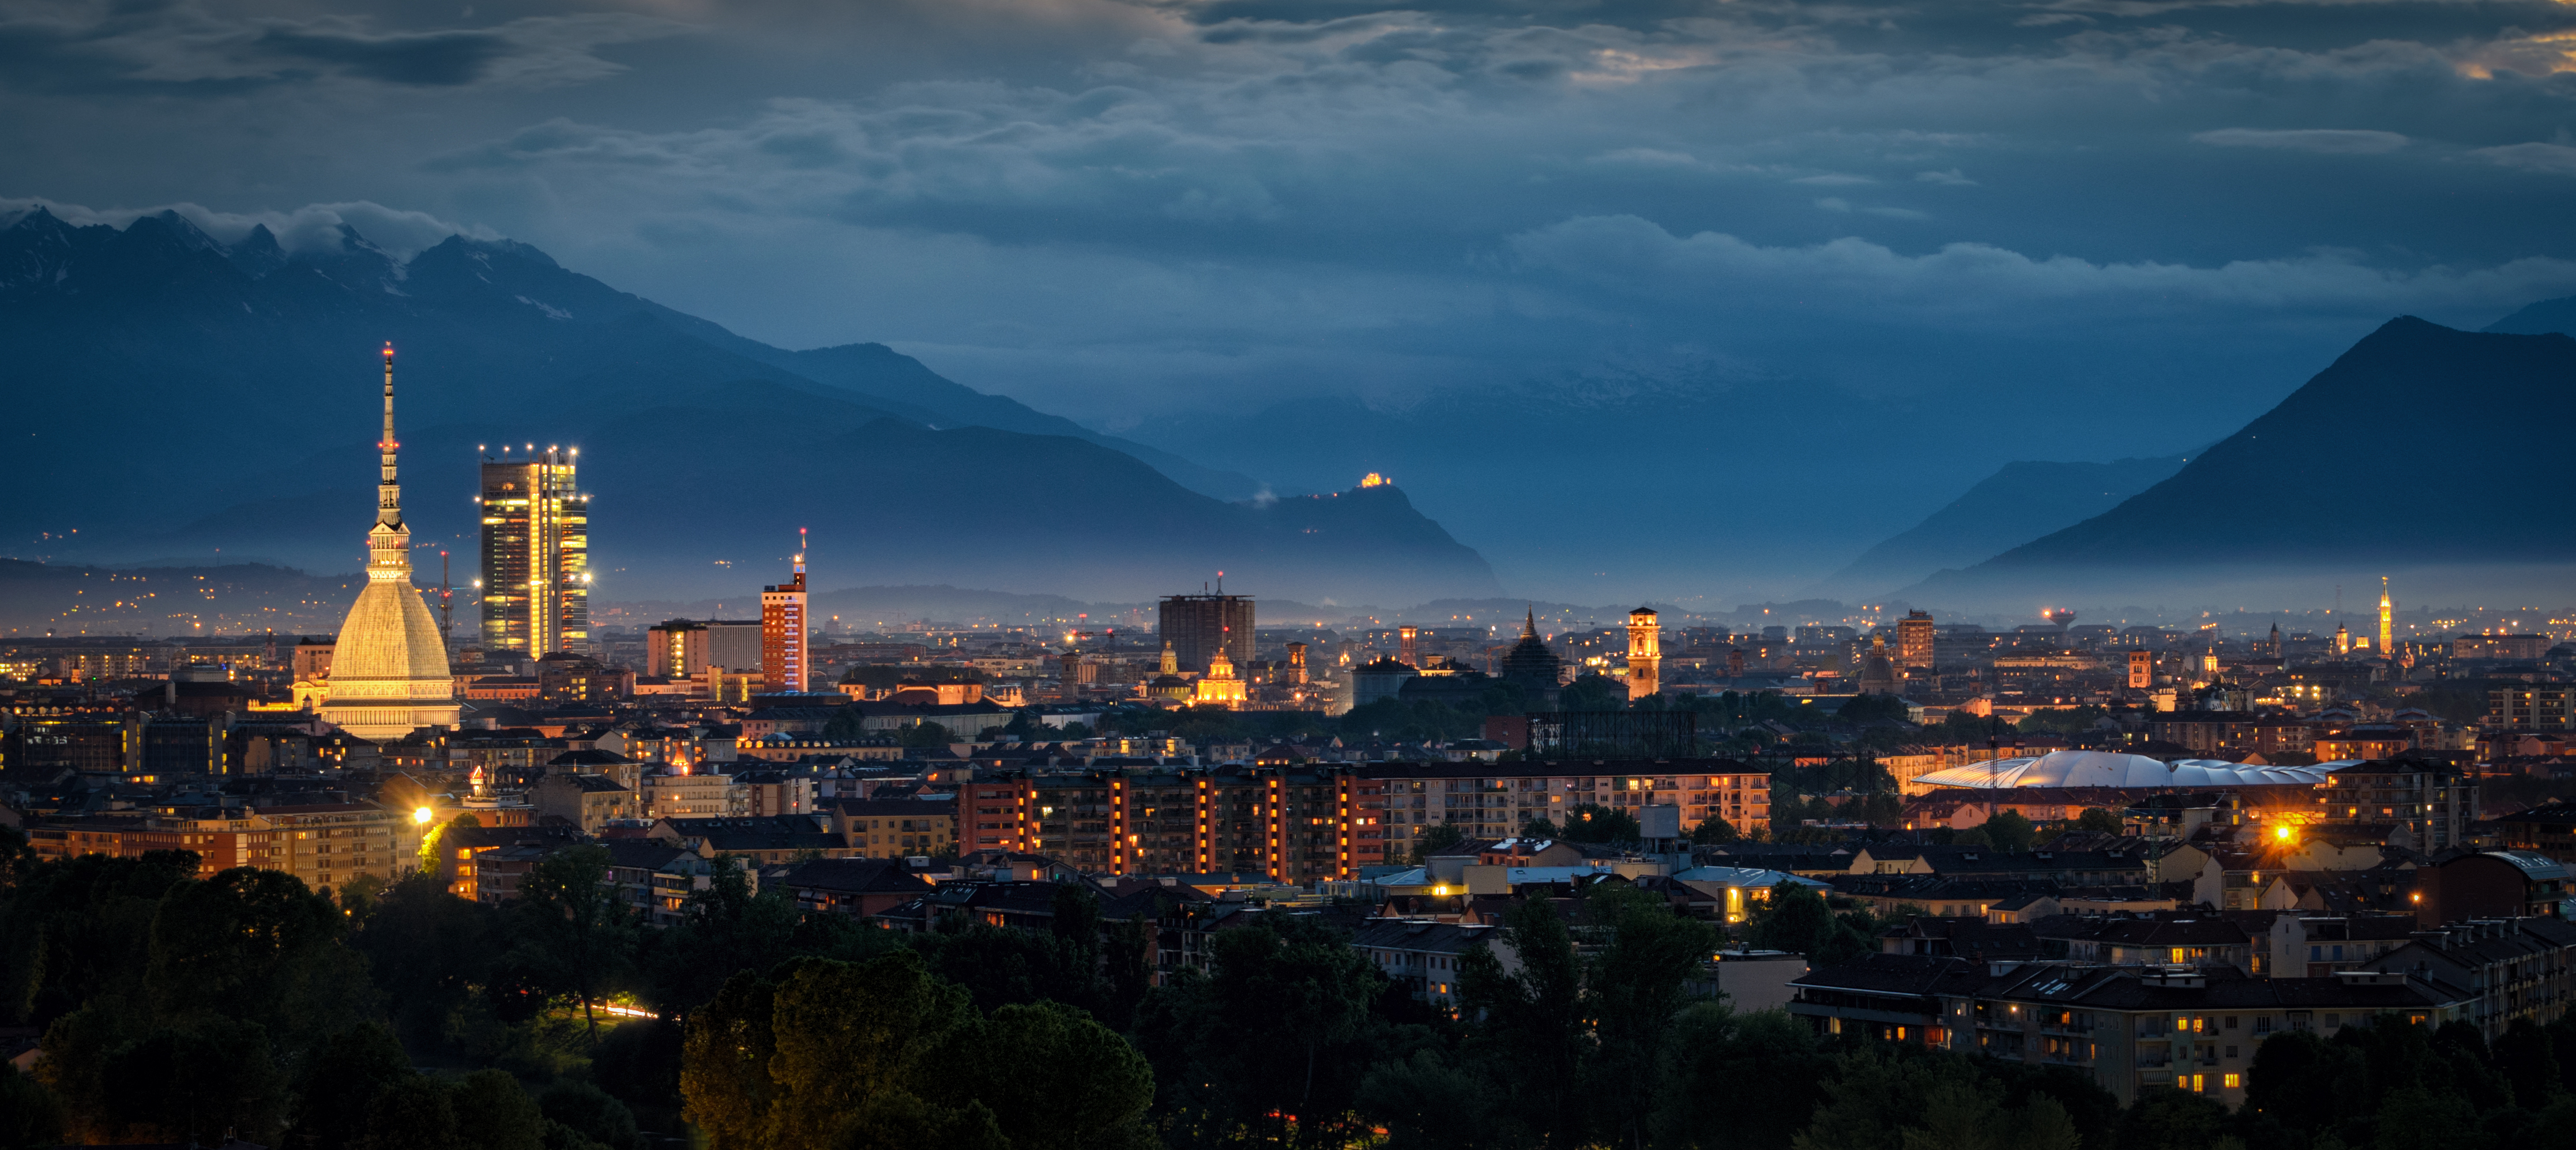 Robusta Taurinorum: skyline di una città in cera di riscatto